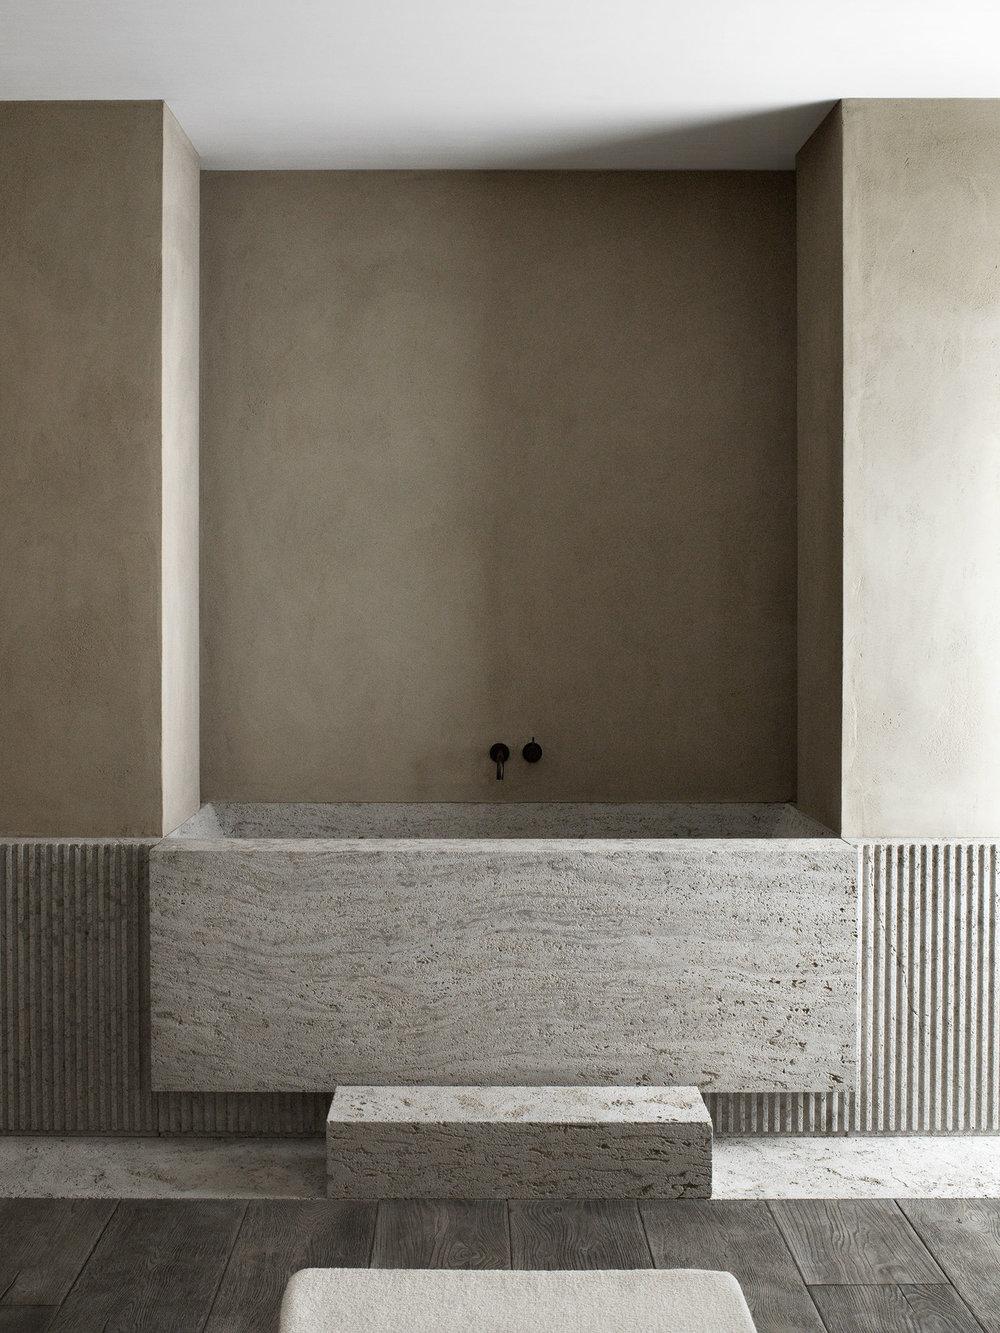 The Bath Salon designed by Nicolas Schuybroek Architects